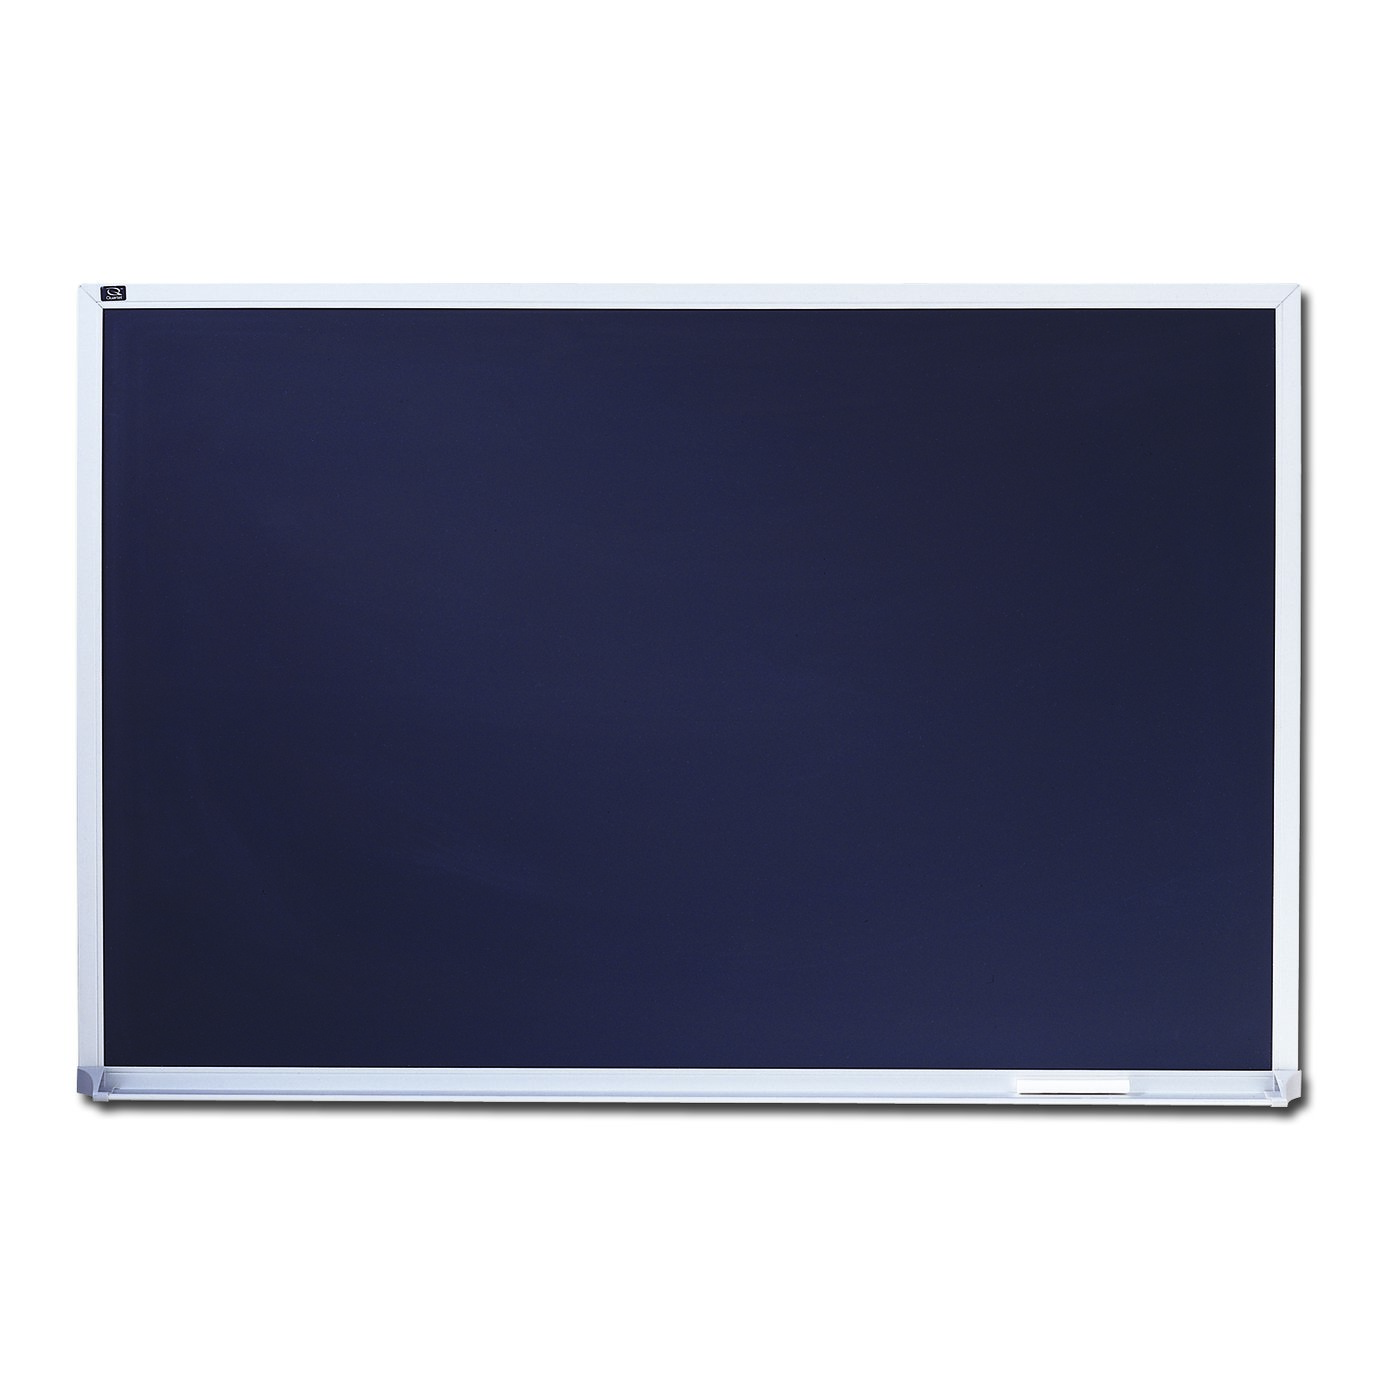 Quartet - Educational Products - Educational Chalkboards - Quartet ...